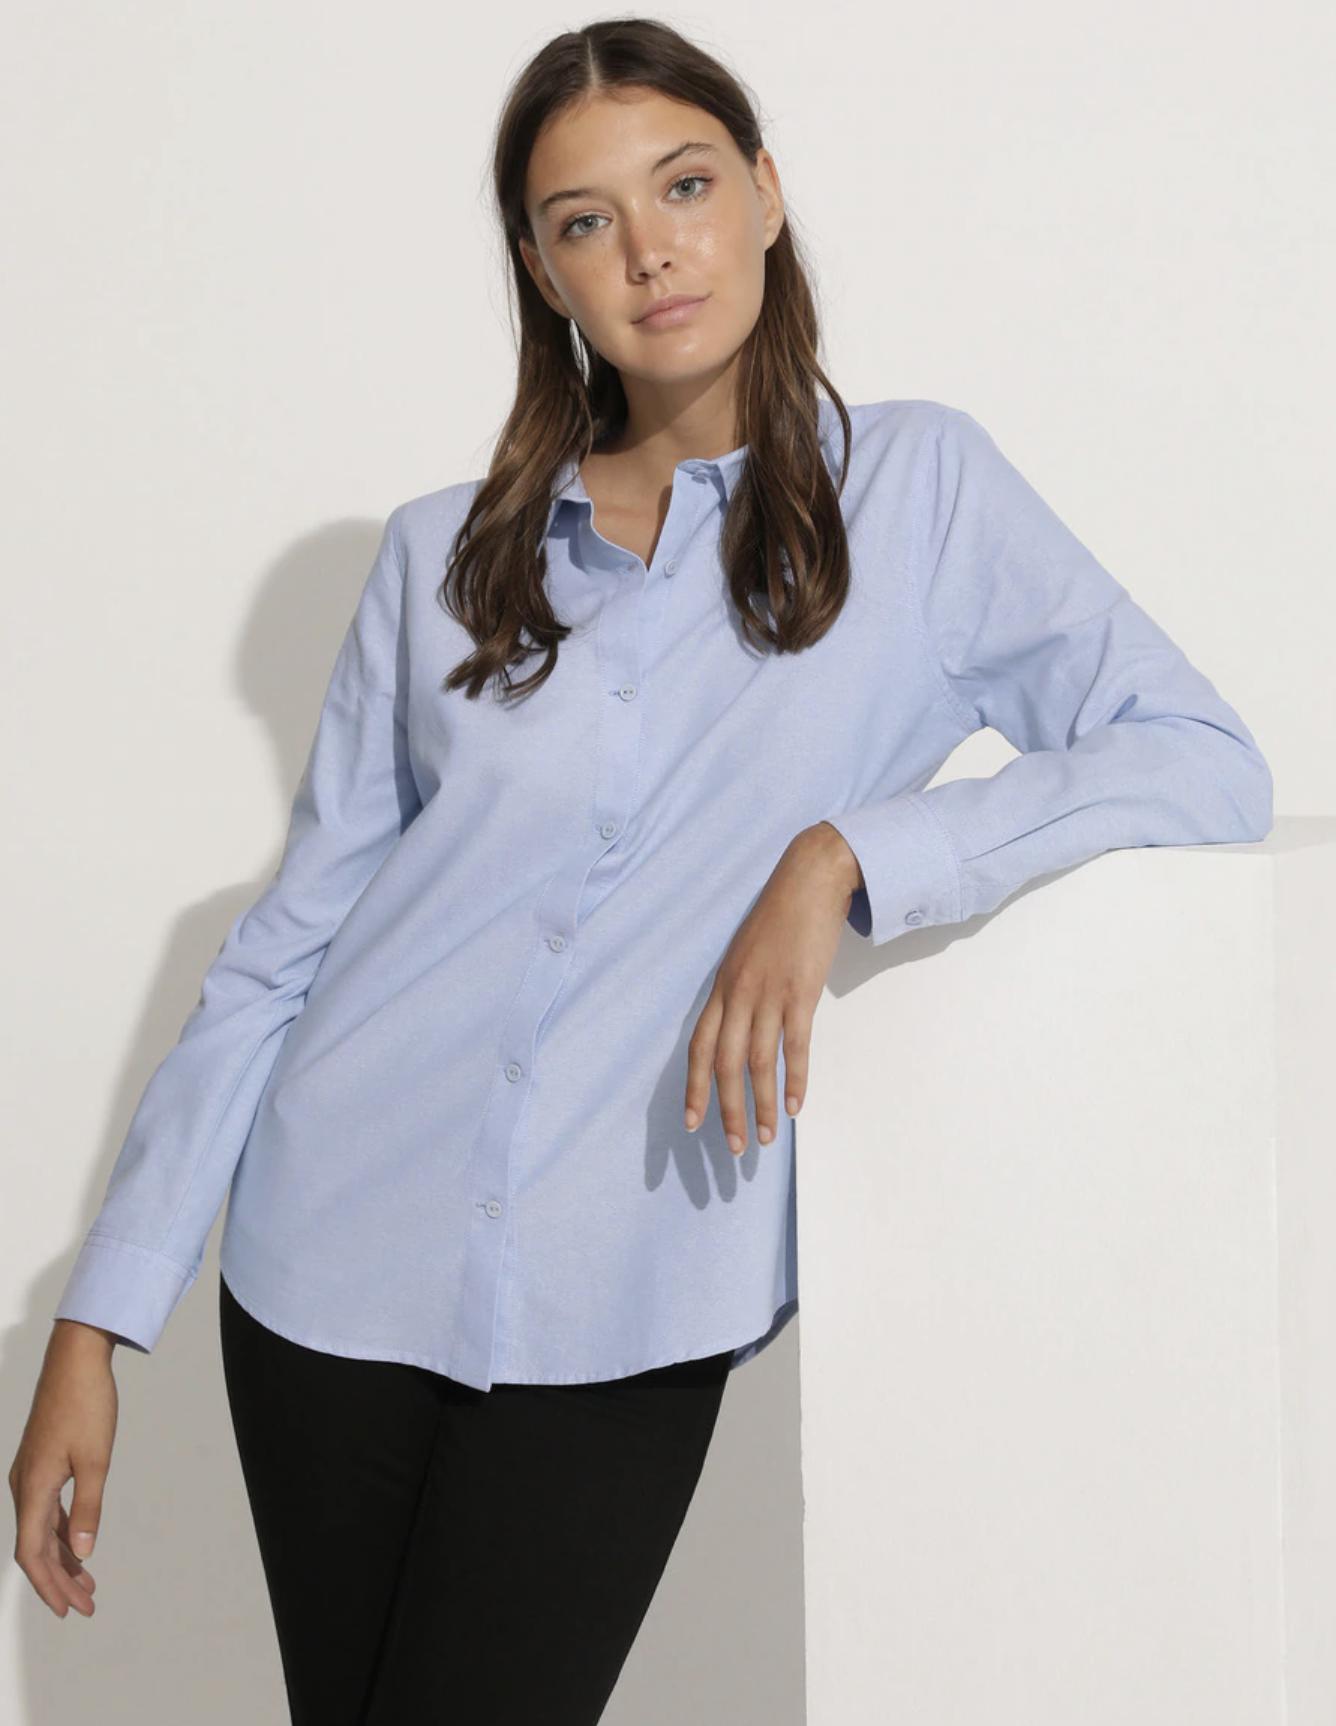 Camisa de mujer Oxford manga larga